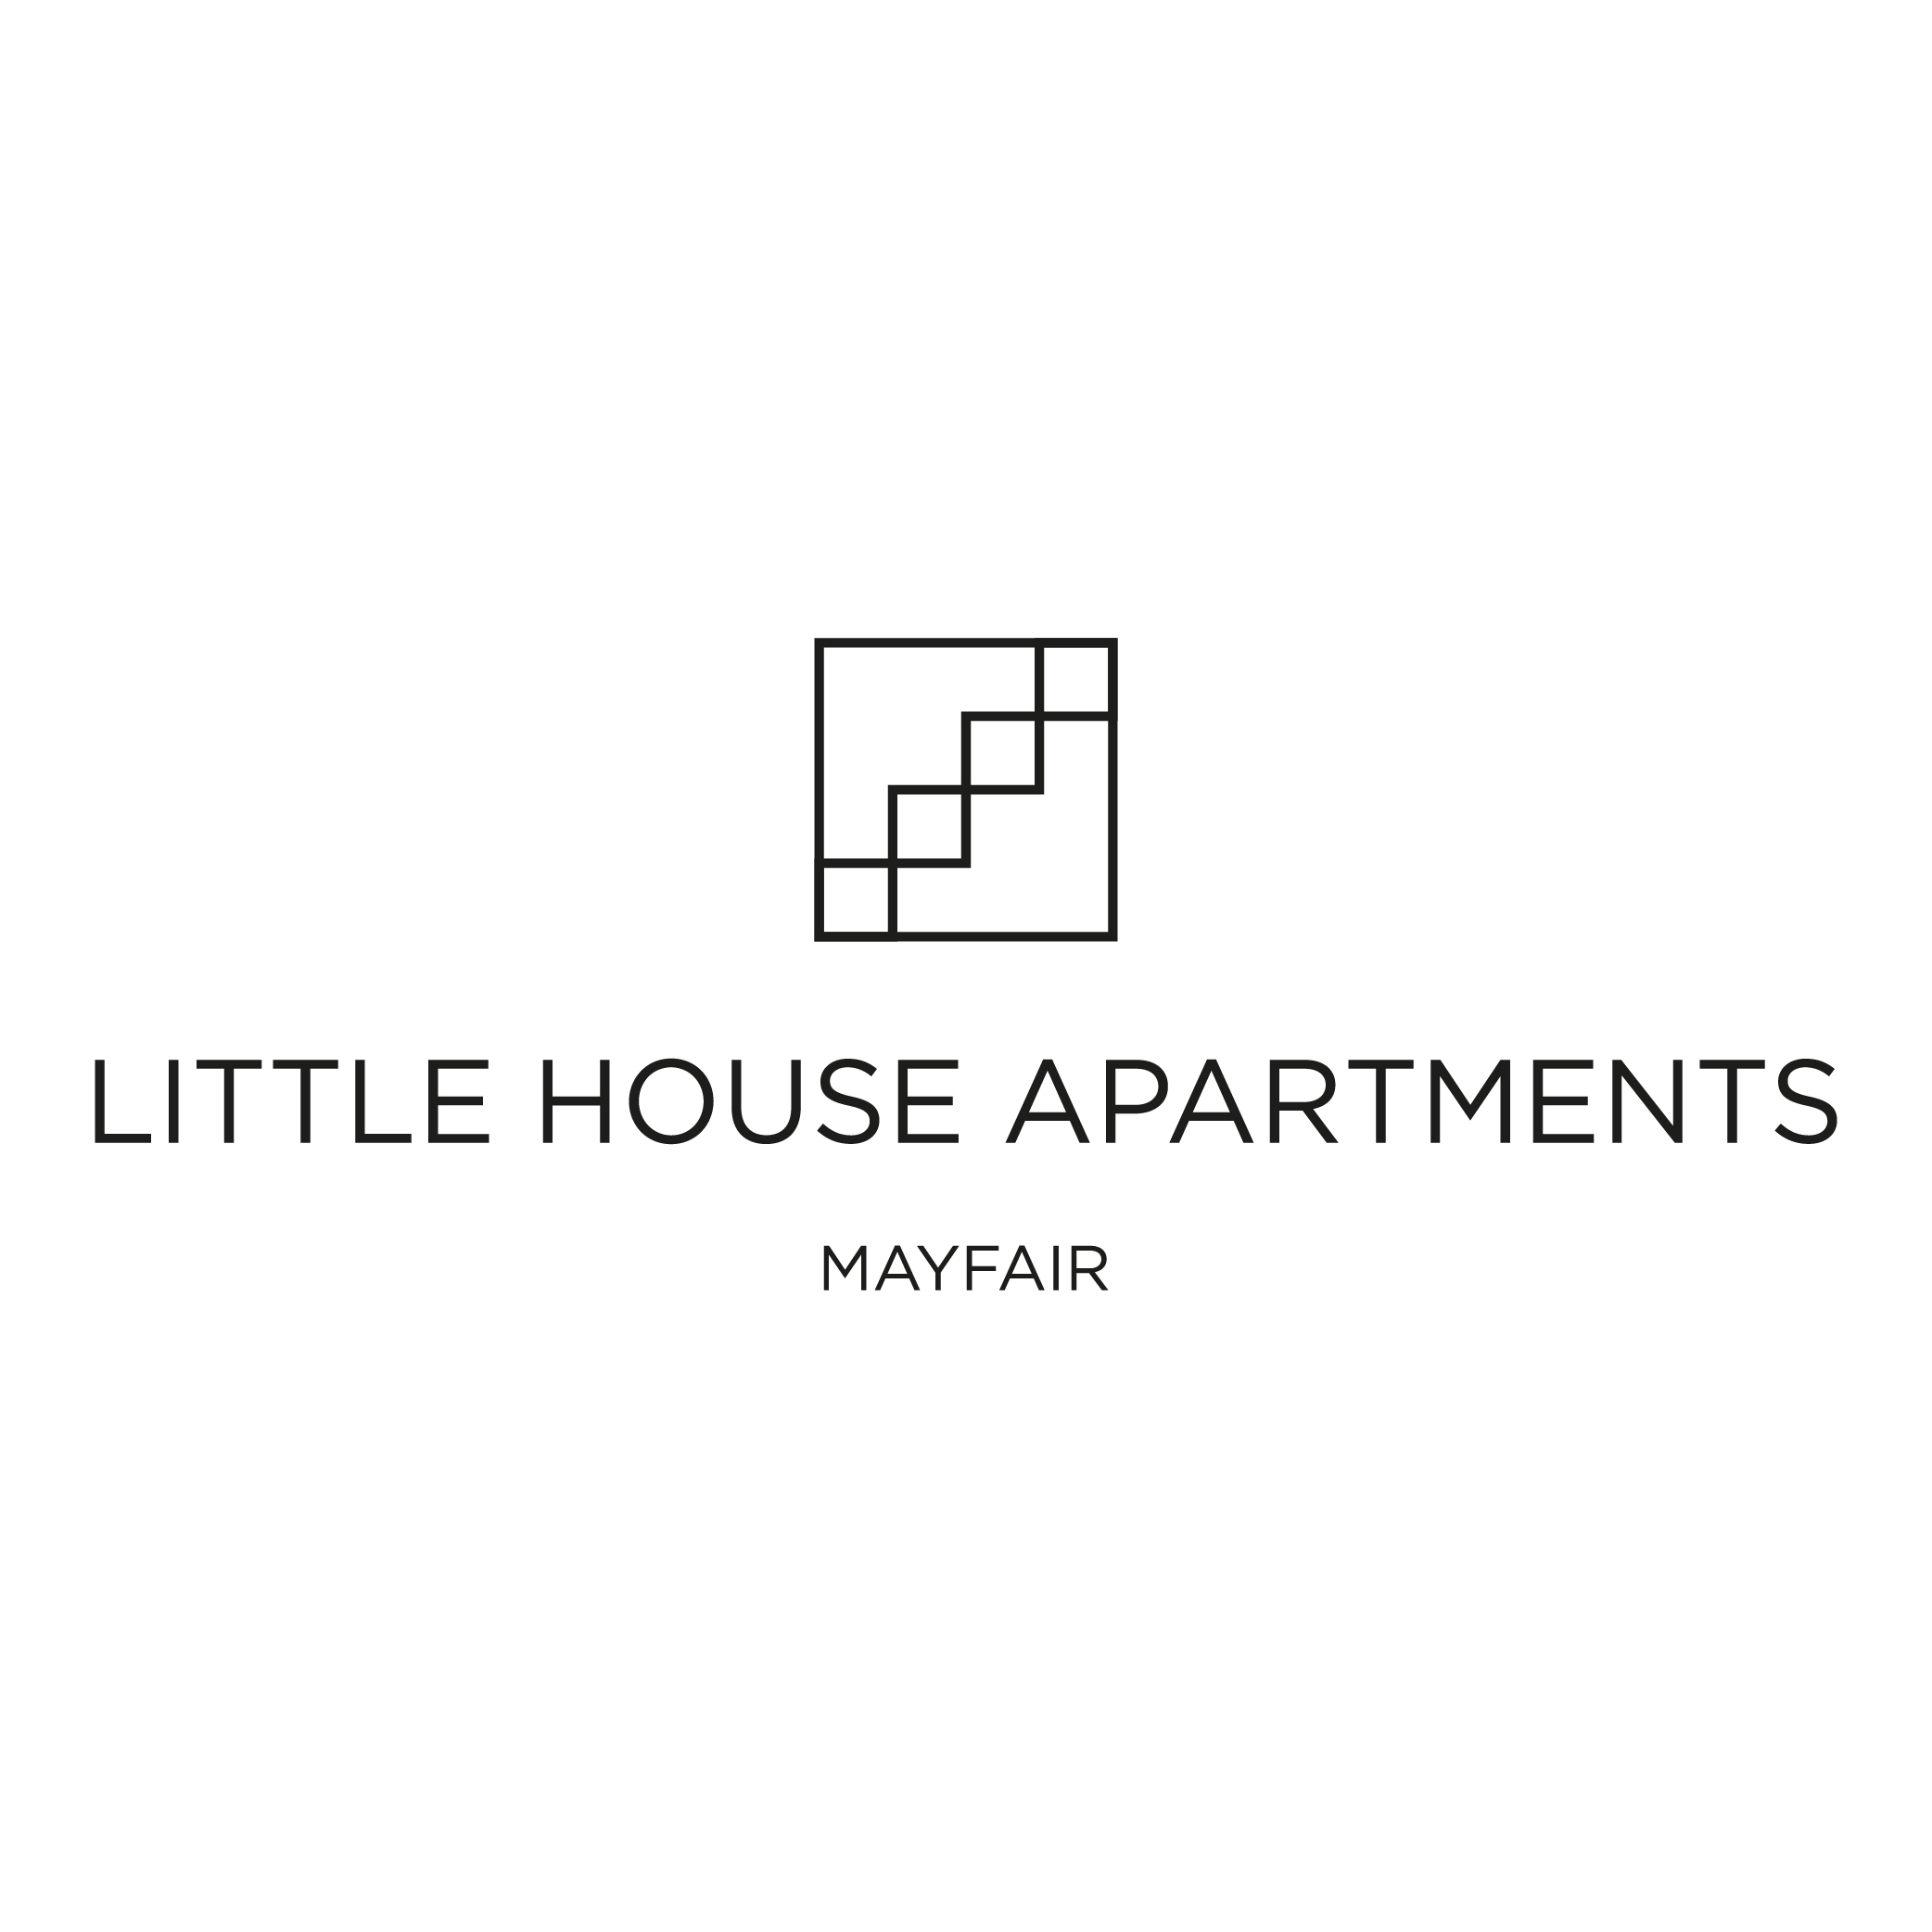 Little House Apartments